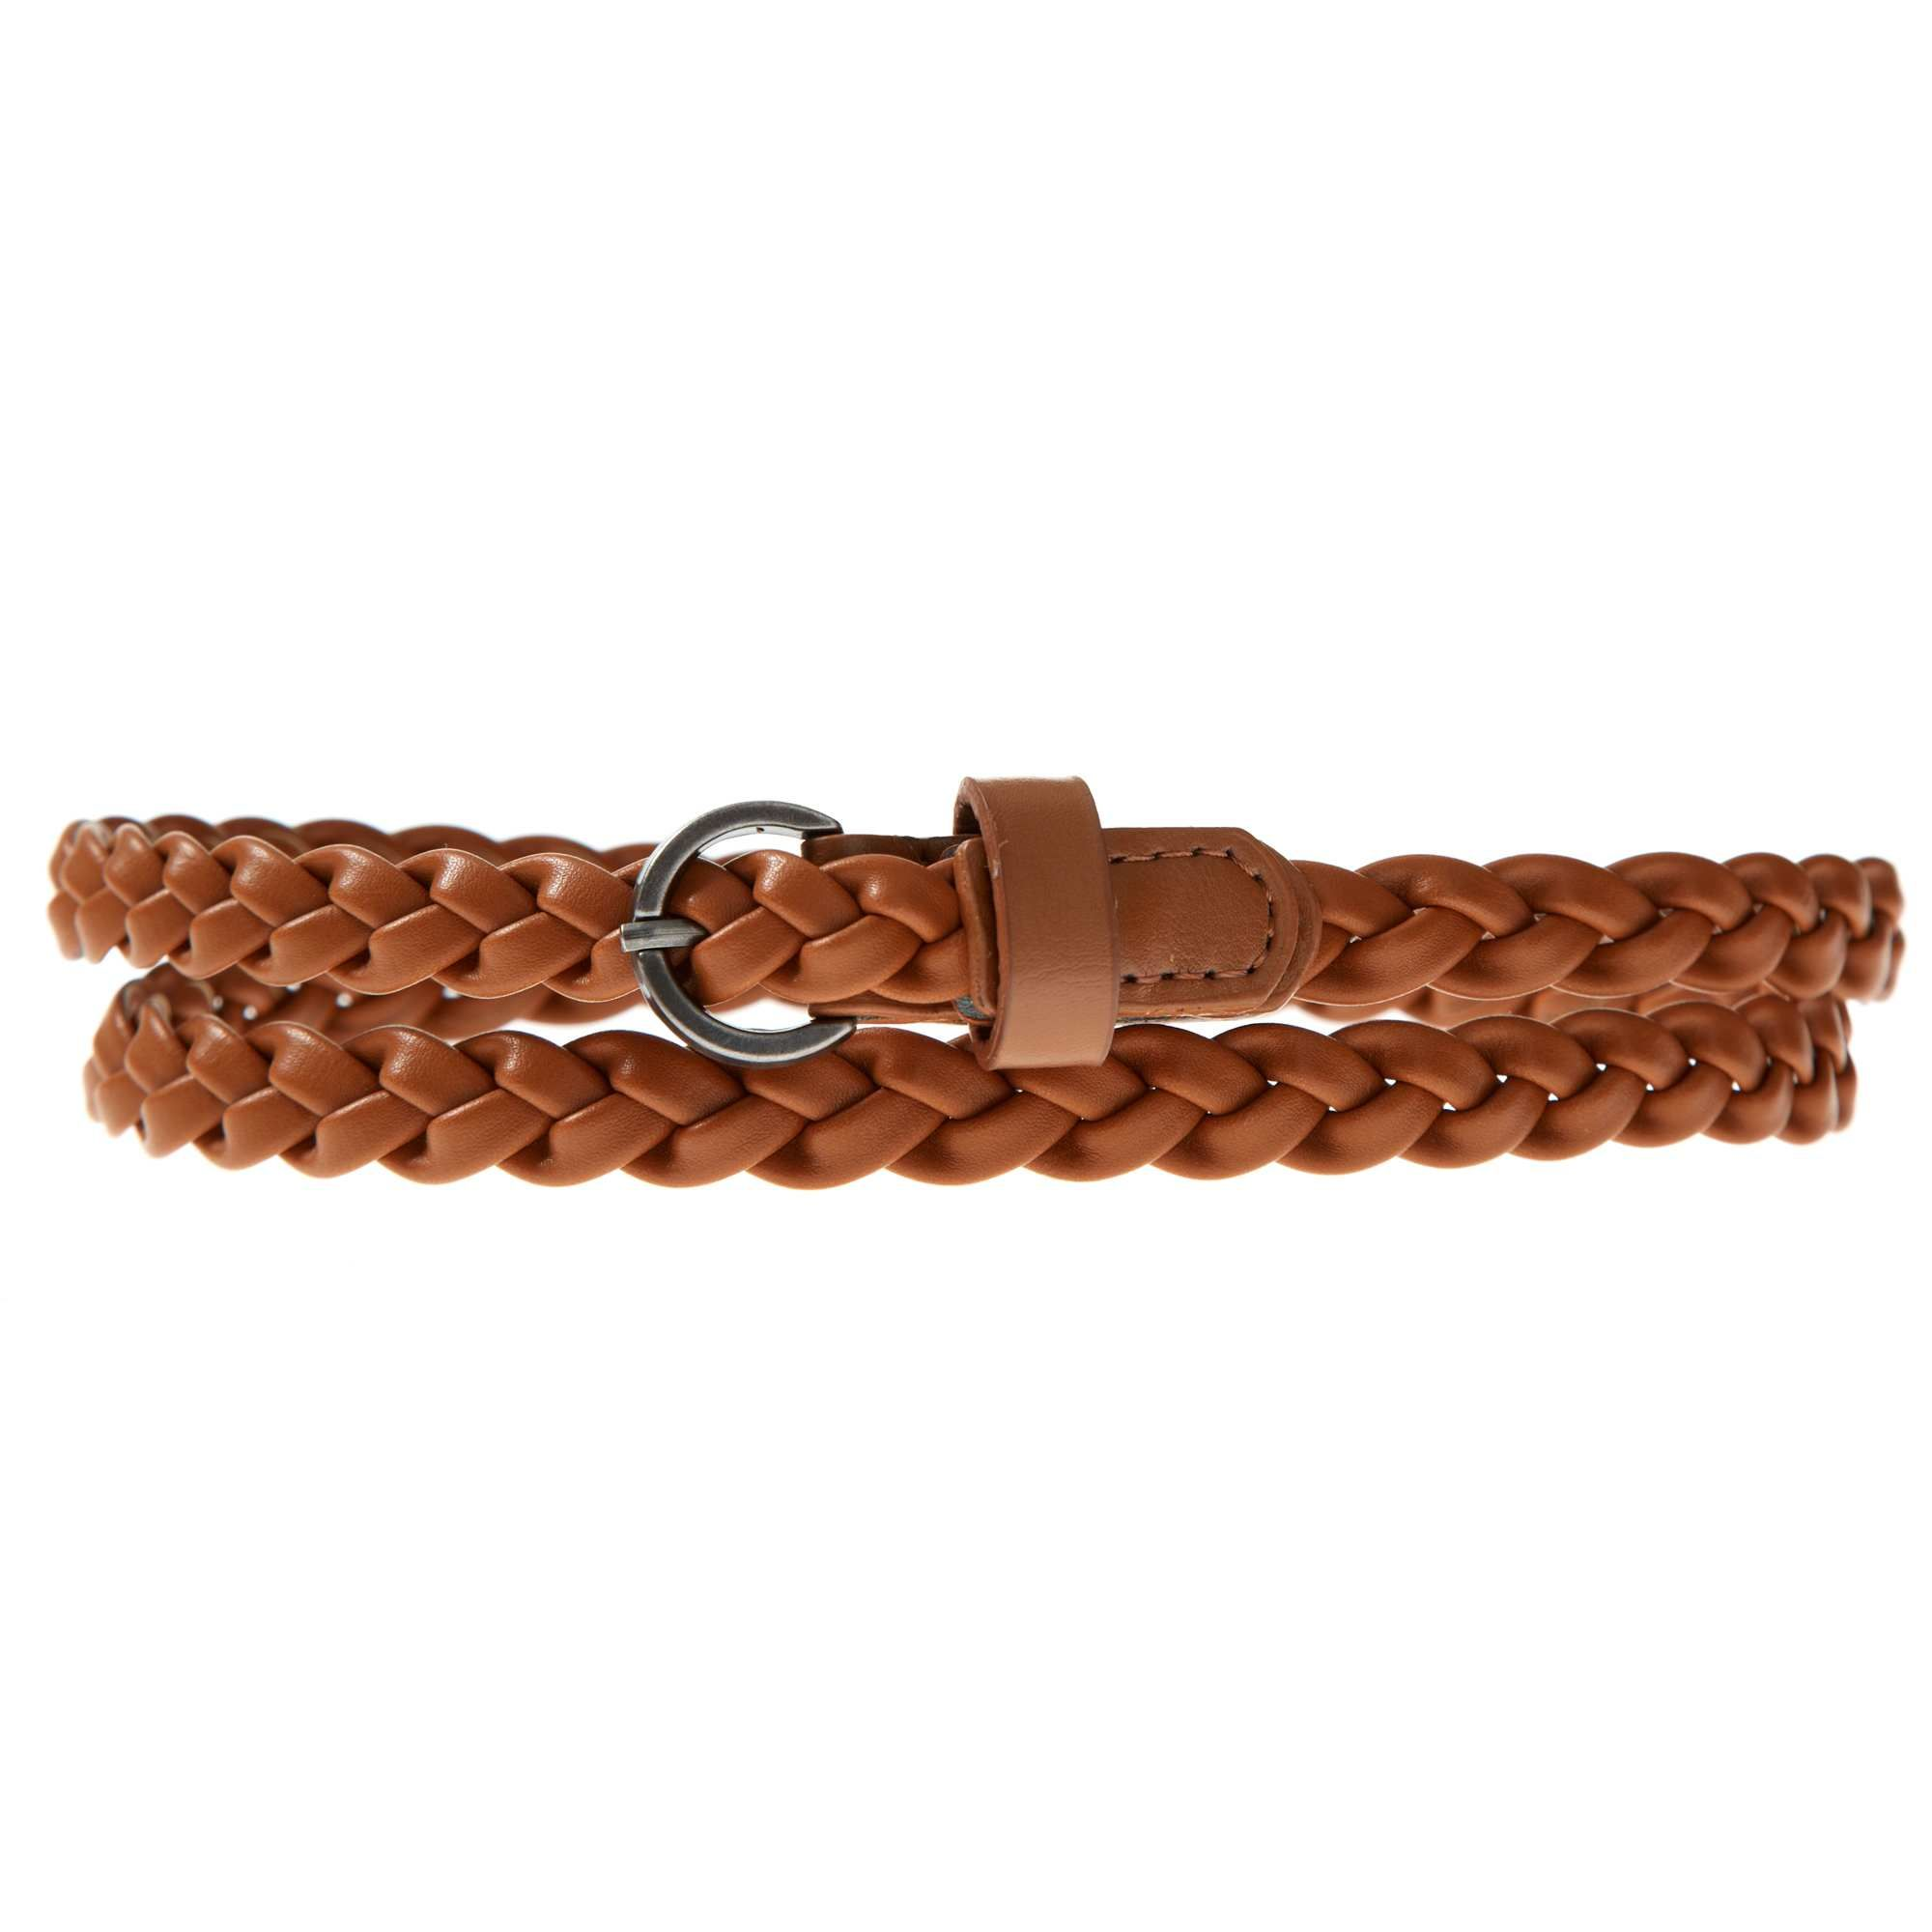 f71dfce5a1f Cinturón fino trenzado Mujer - Kiabi - 1